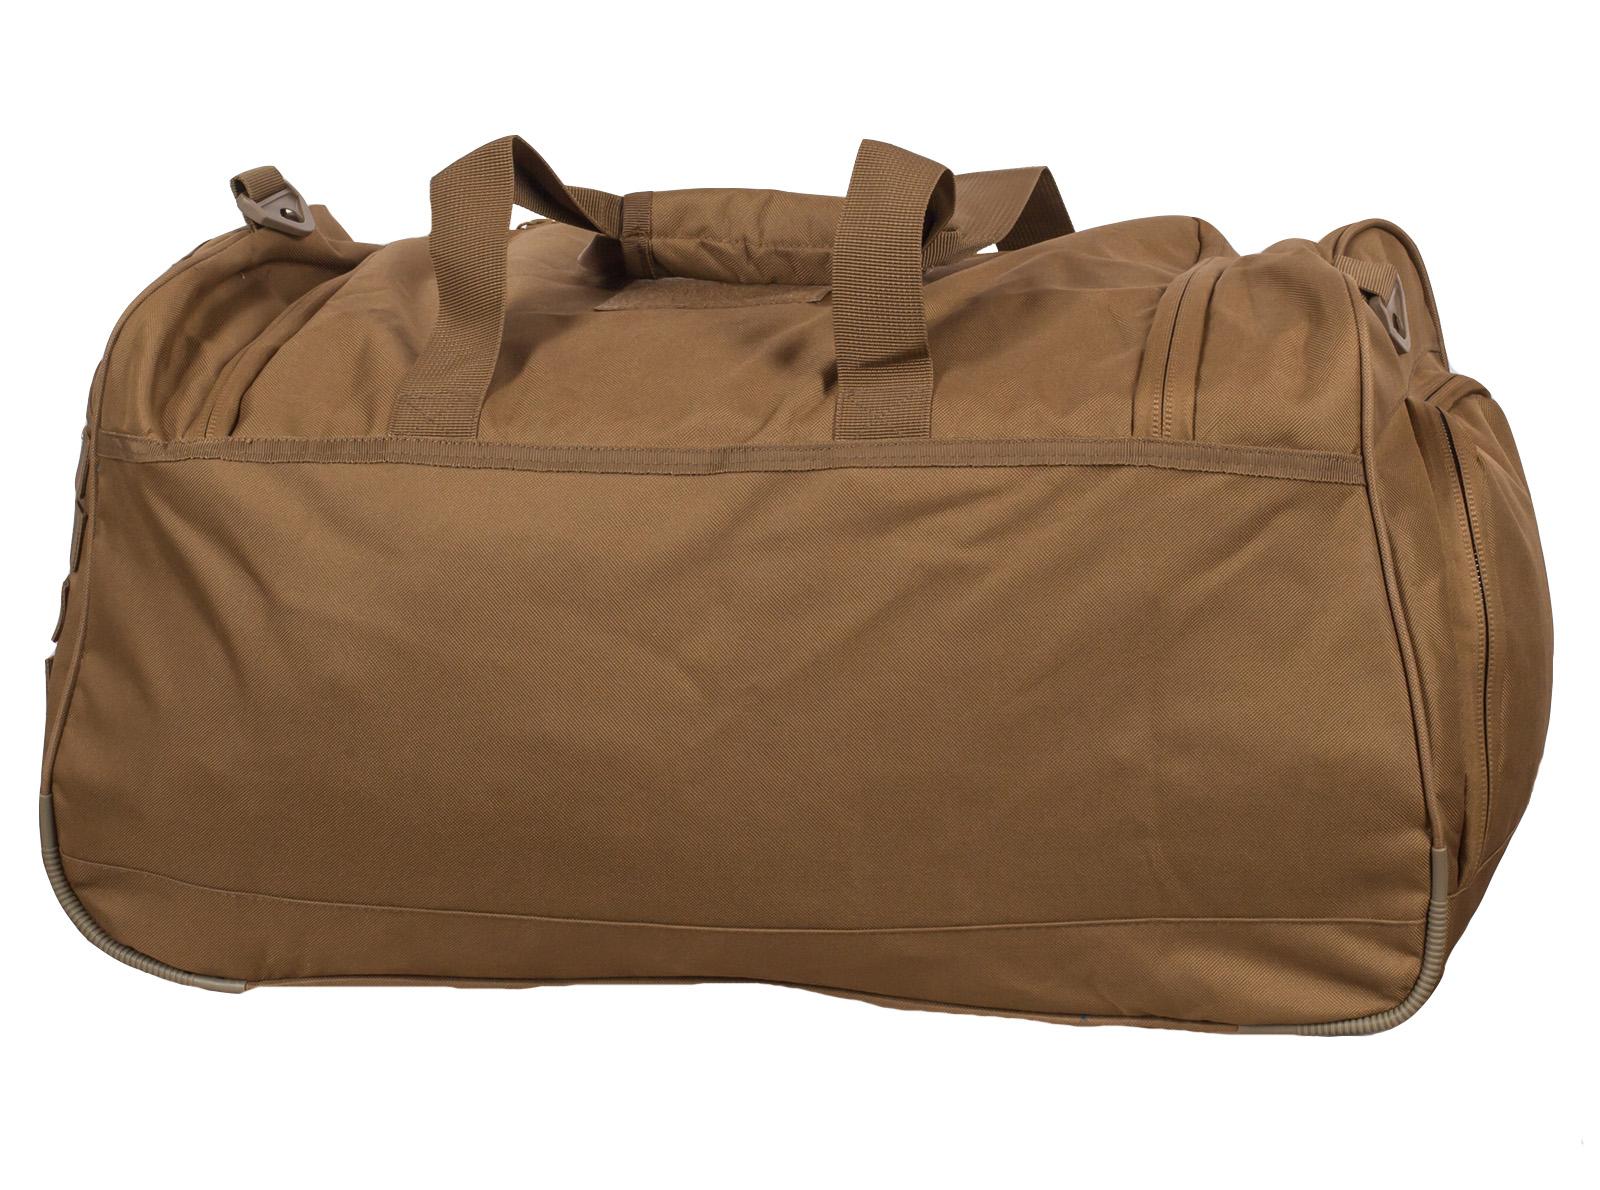 Снаряжение десанта: от балаклав до сумок